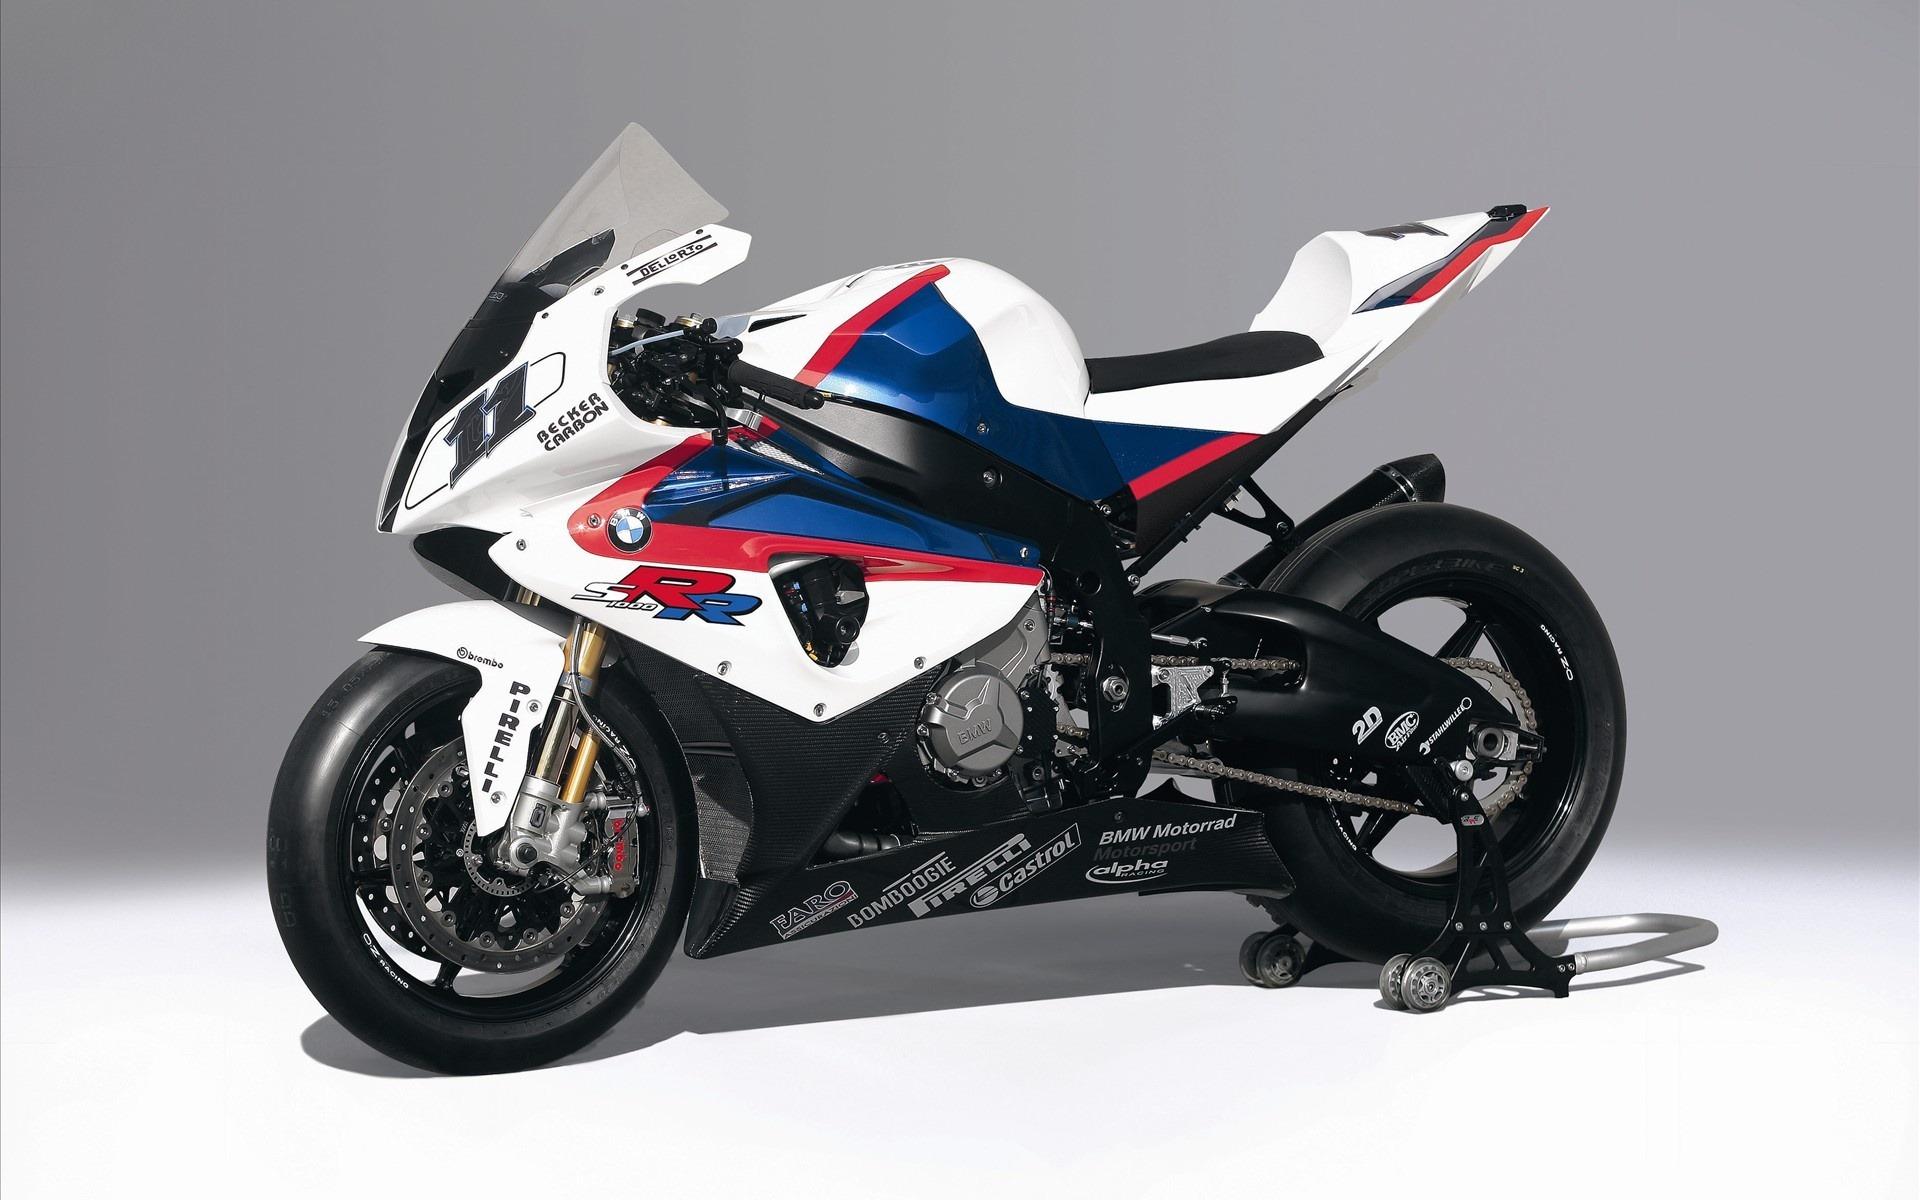 Bmw S1000 Rr Racebike Bike Motorcycle Fondo De Pantalla Hd